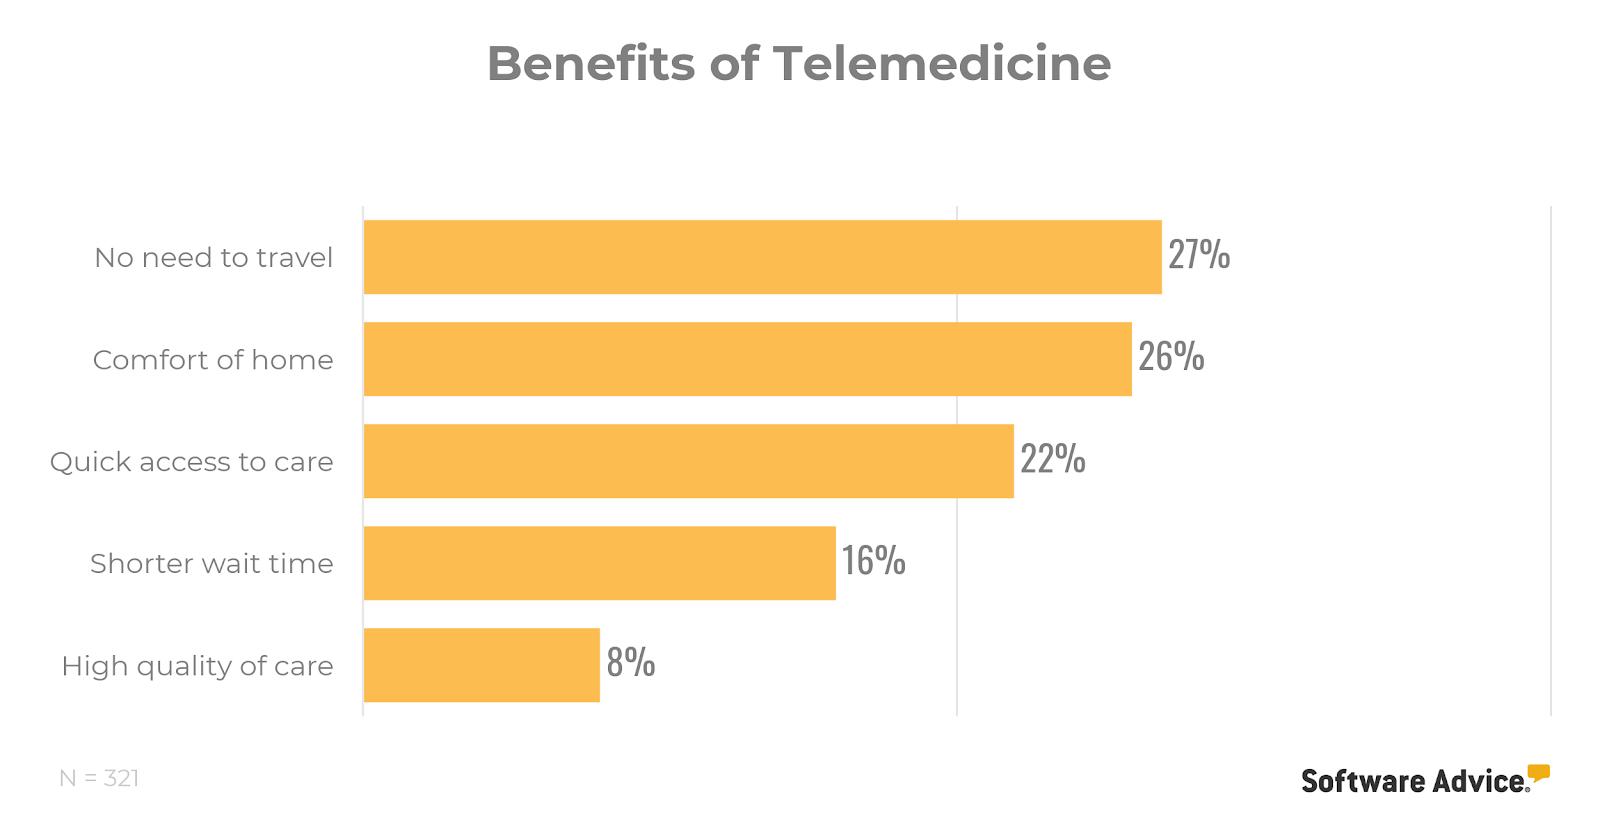 benefits of telemedicine chart